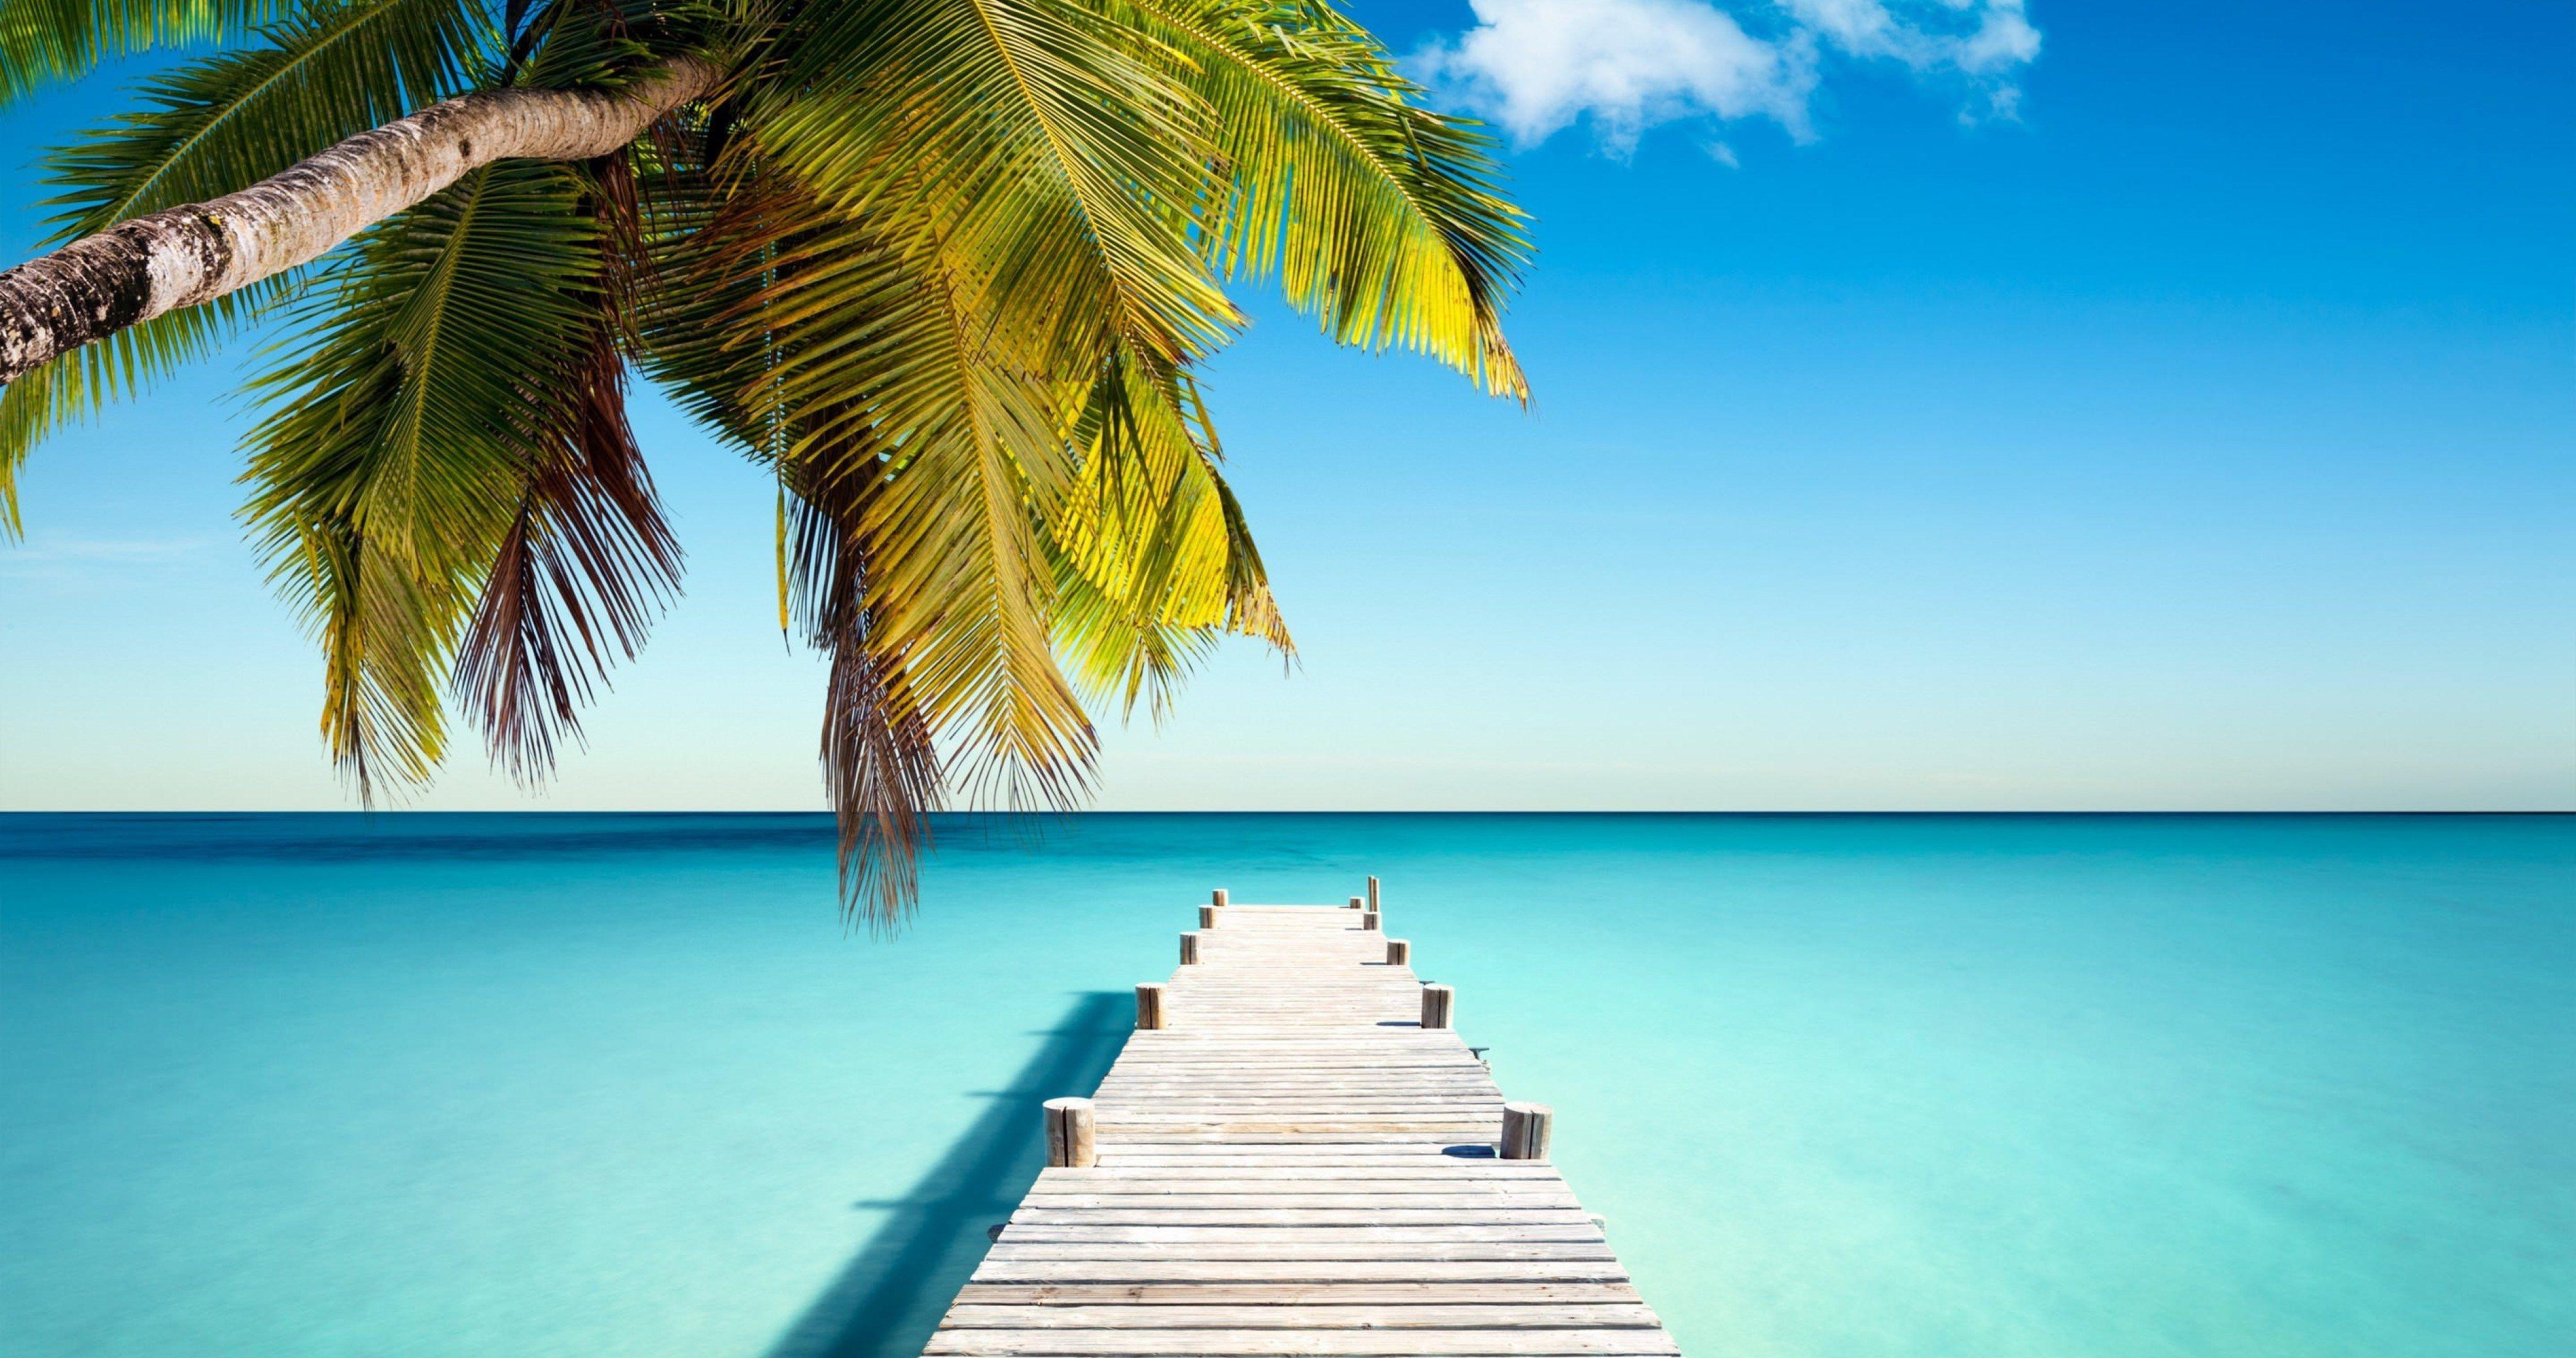 Tropical Paradise Beach 4k Hd Desktop Wallpaper For 4k: Tropical Paradise With Palm 4k Ultra Hd Wallpaper